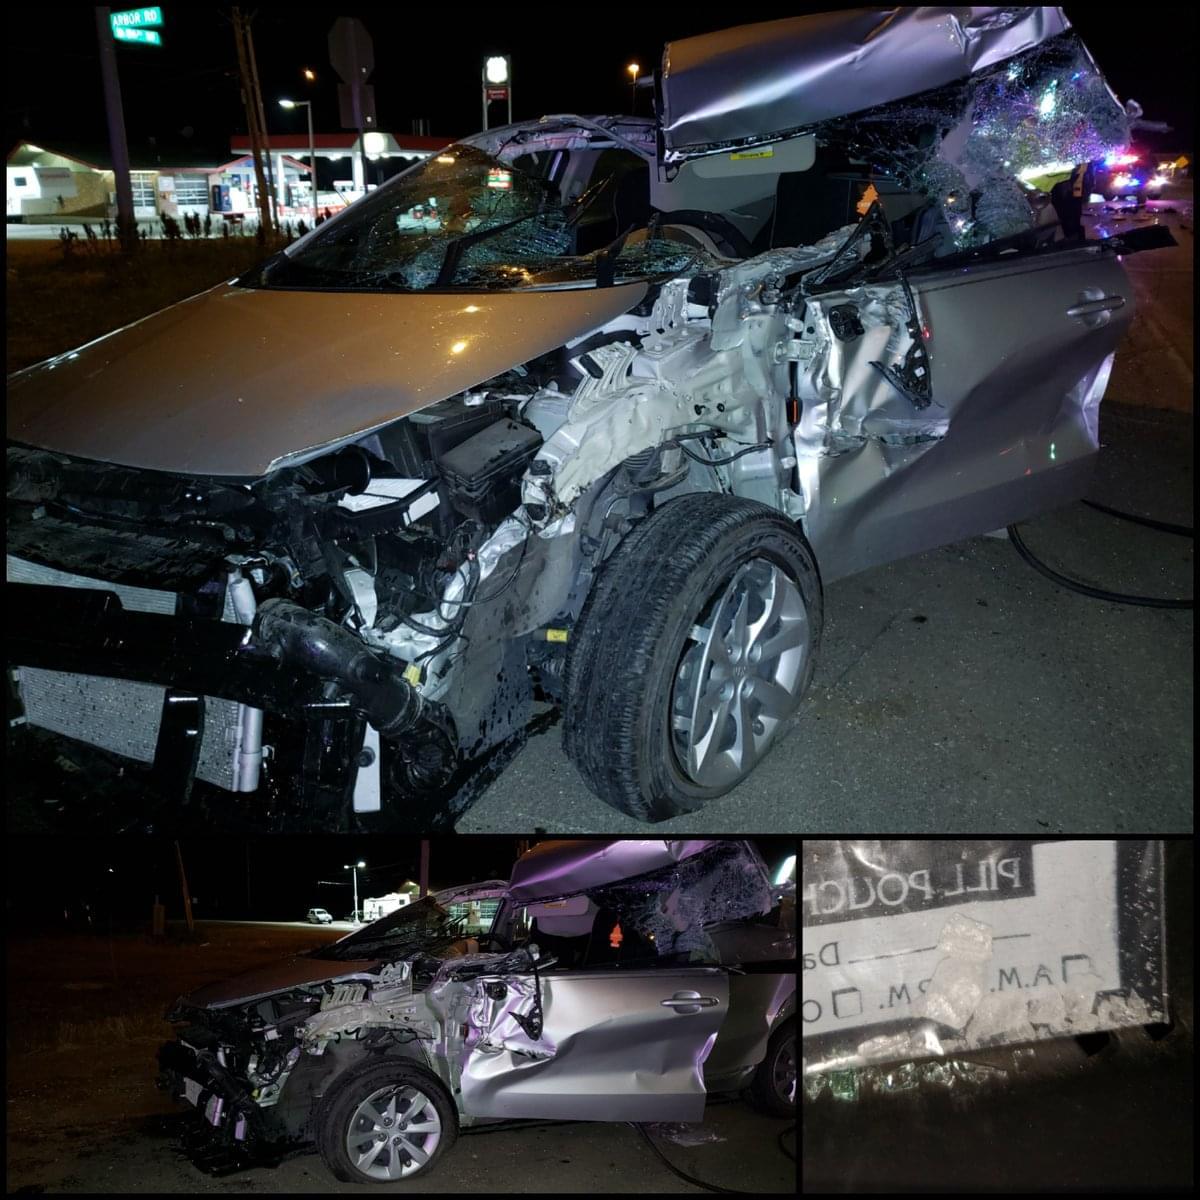 Woman Suffers Life-Threatening Injuries In Morning Crash